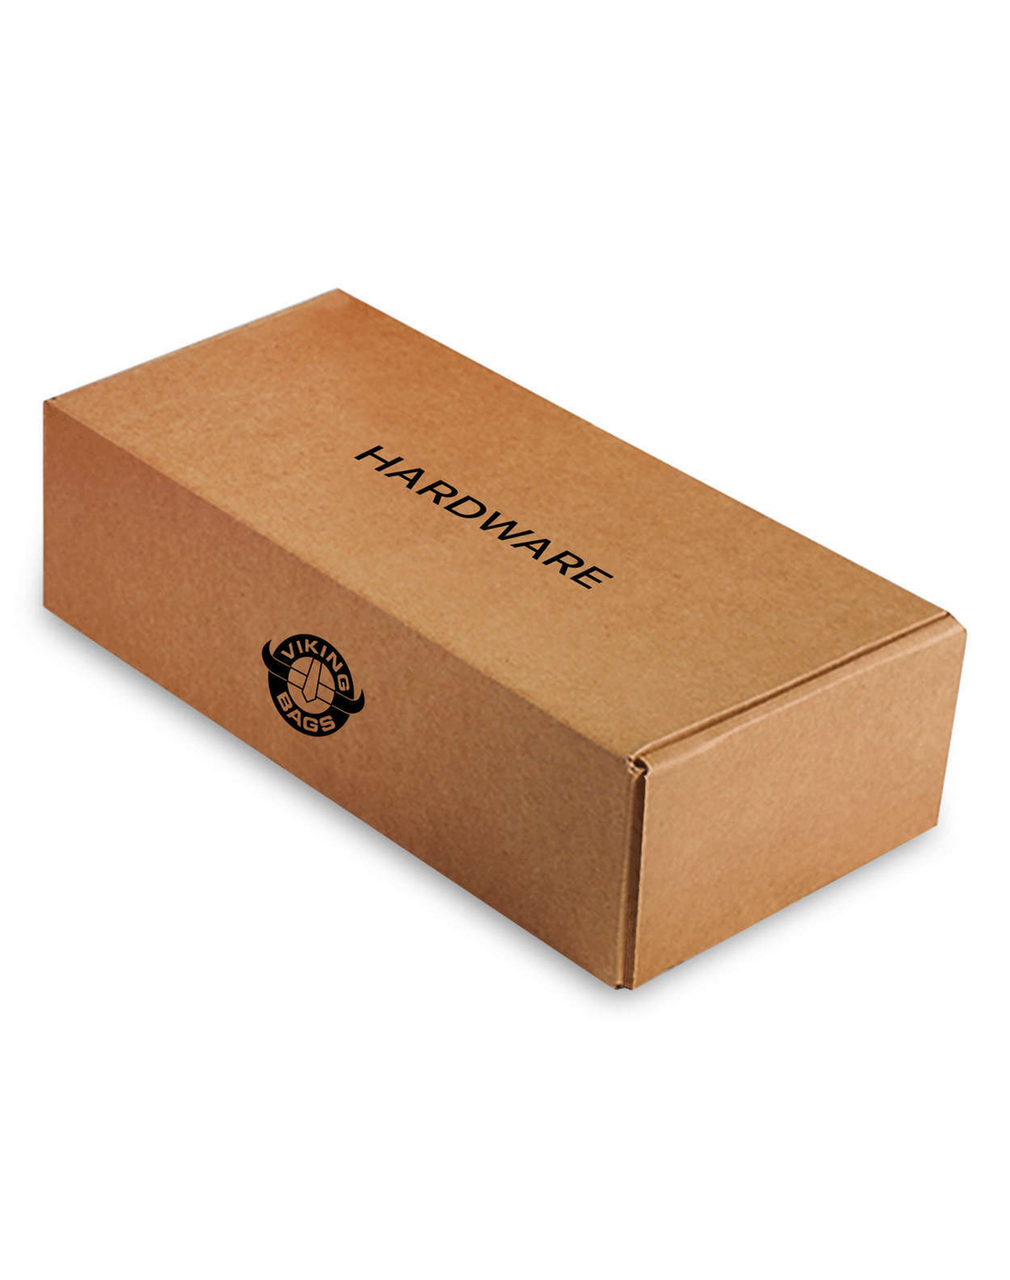 Honda 1500 Valkyrie Interstate Spear Shock Cutout Motorcycle Saddlebags Hardware Box